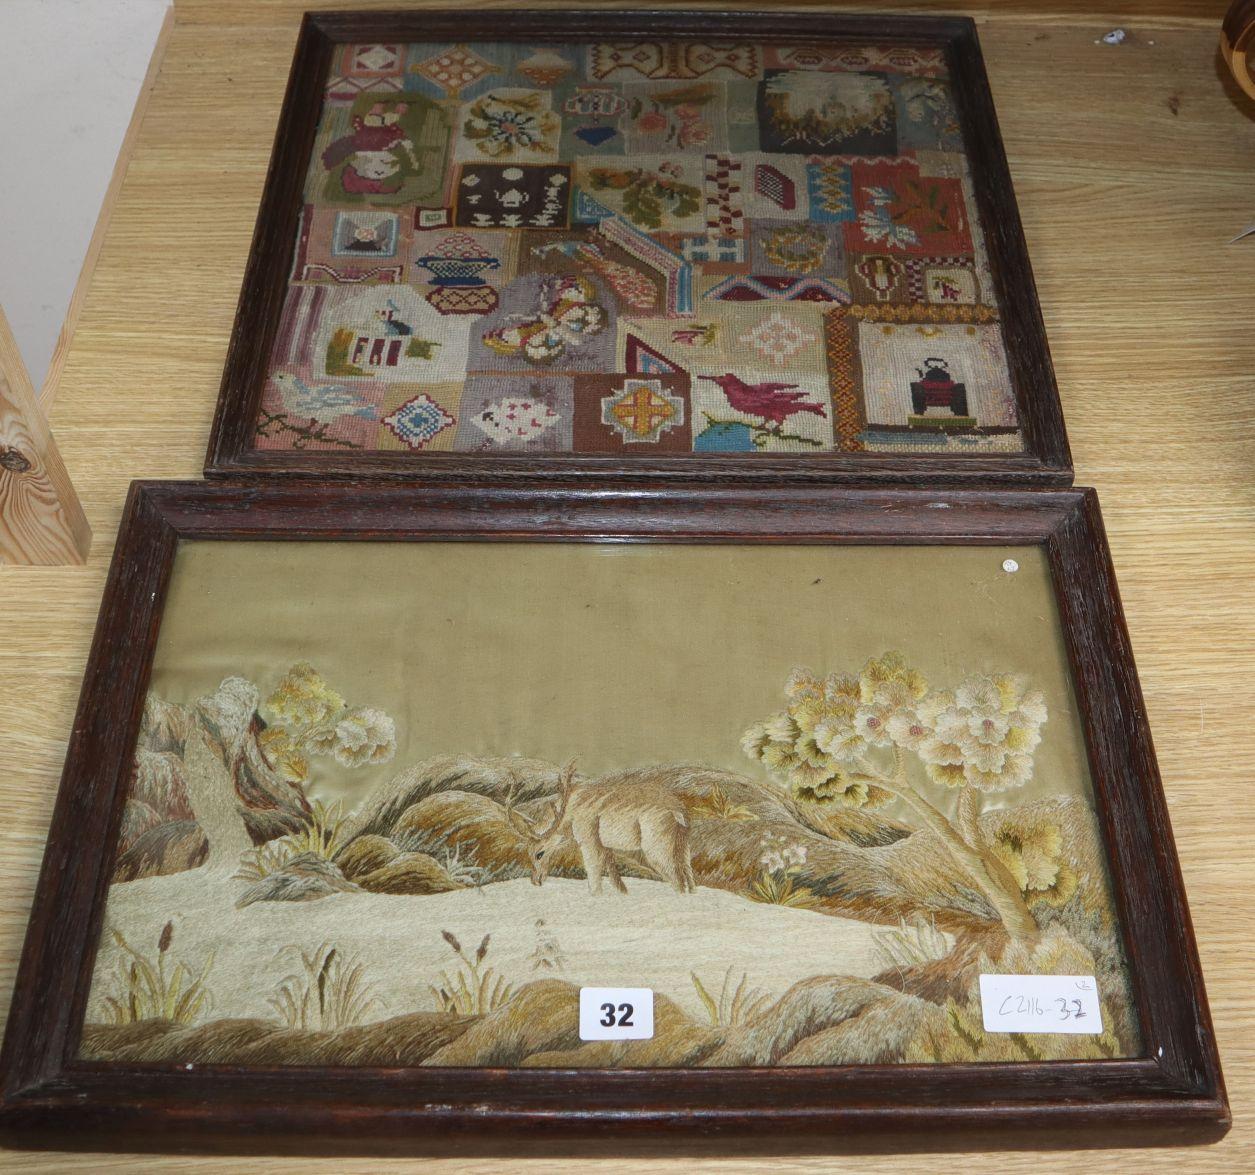 Lot 186 - A Victorian needlework panel depicting a stag in a landscape, a Victorian oval needlework panel,